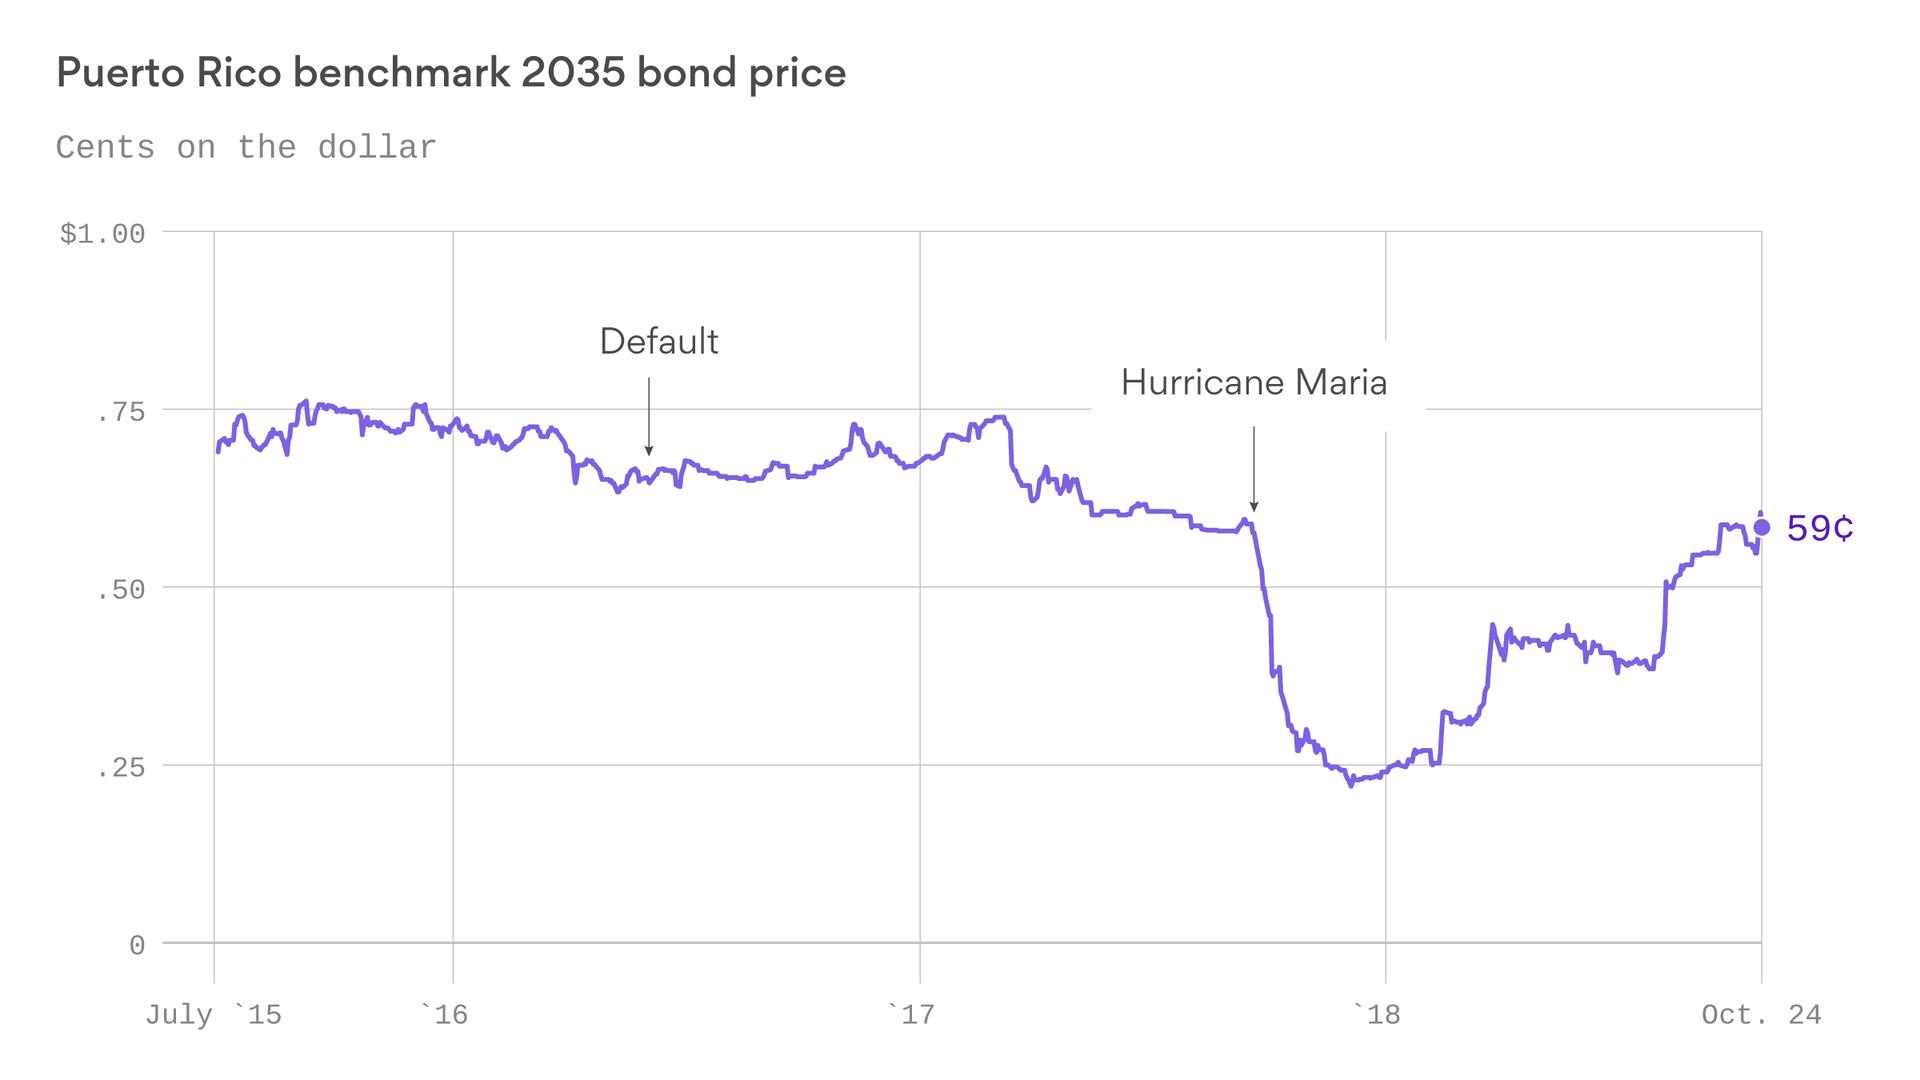 Puerto Rico's unlikely financial bounceback